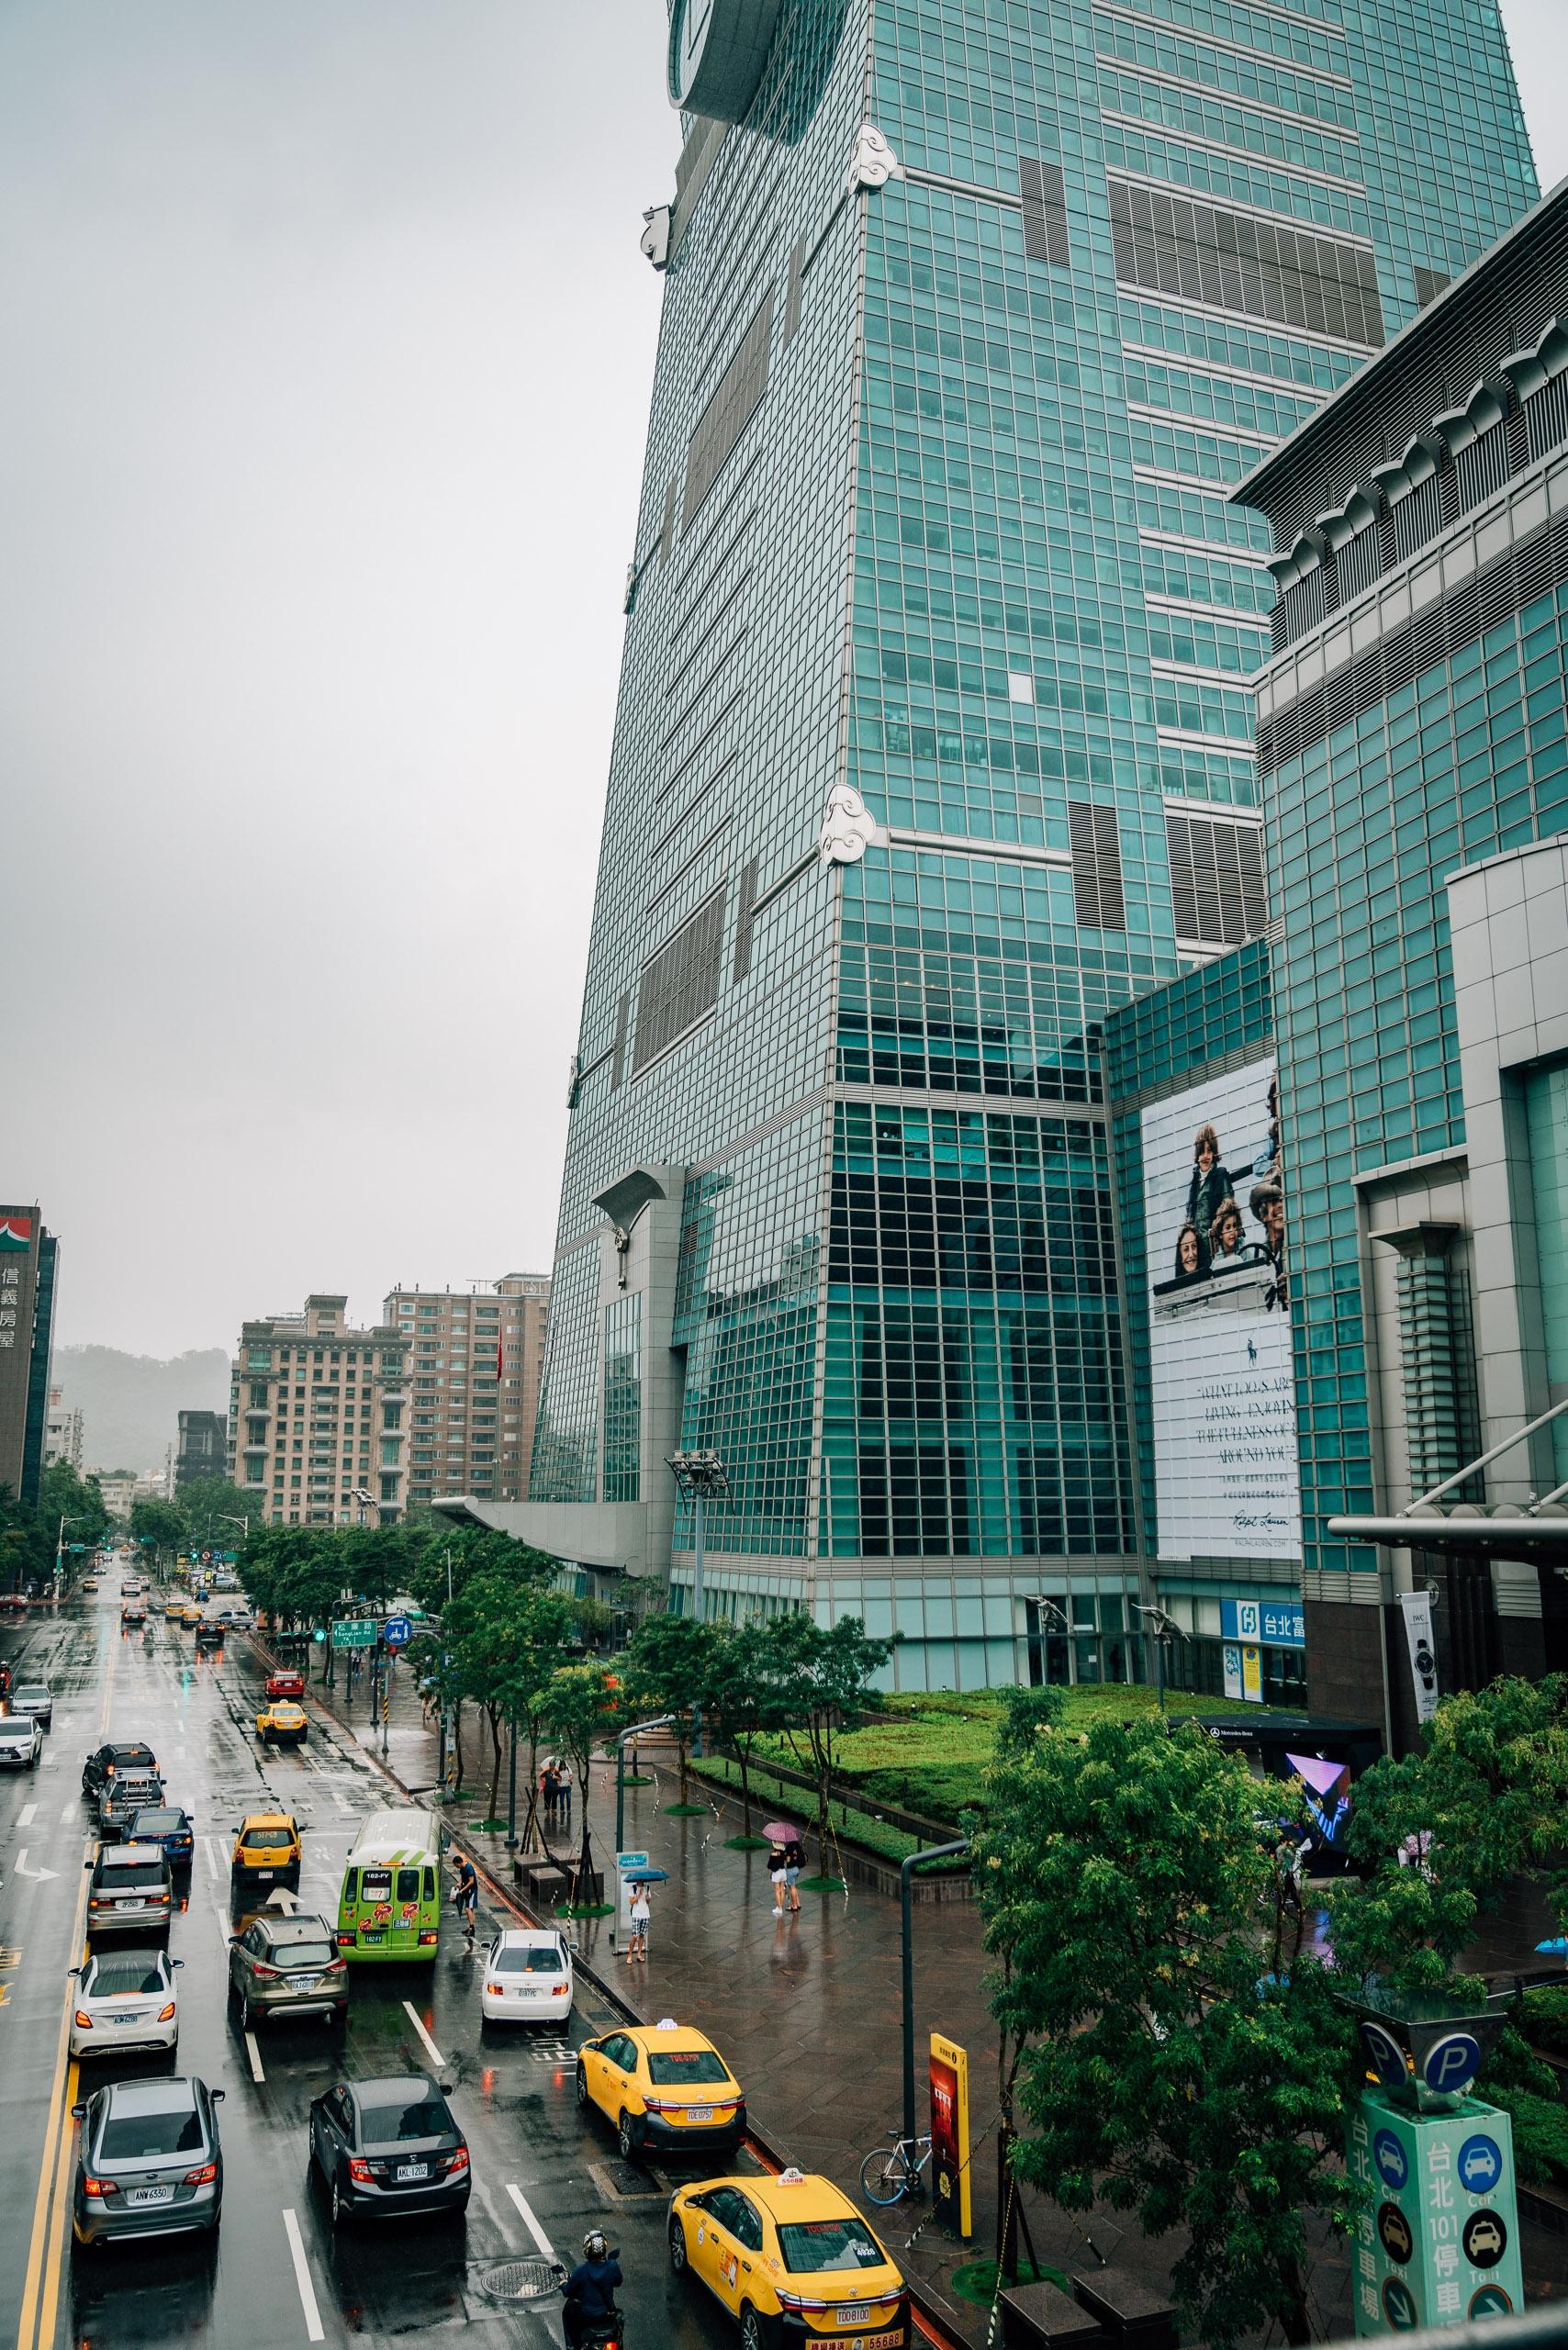 A Rainy Day outside Taipei 101